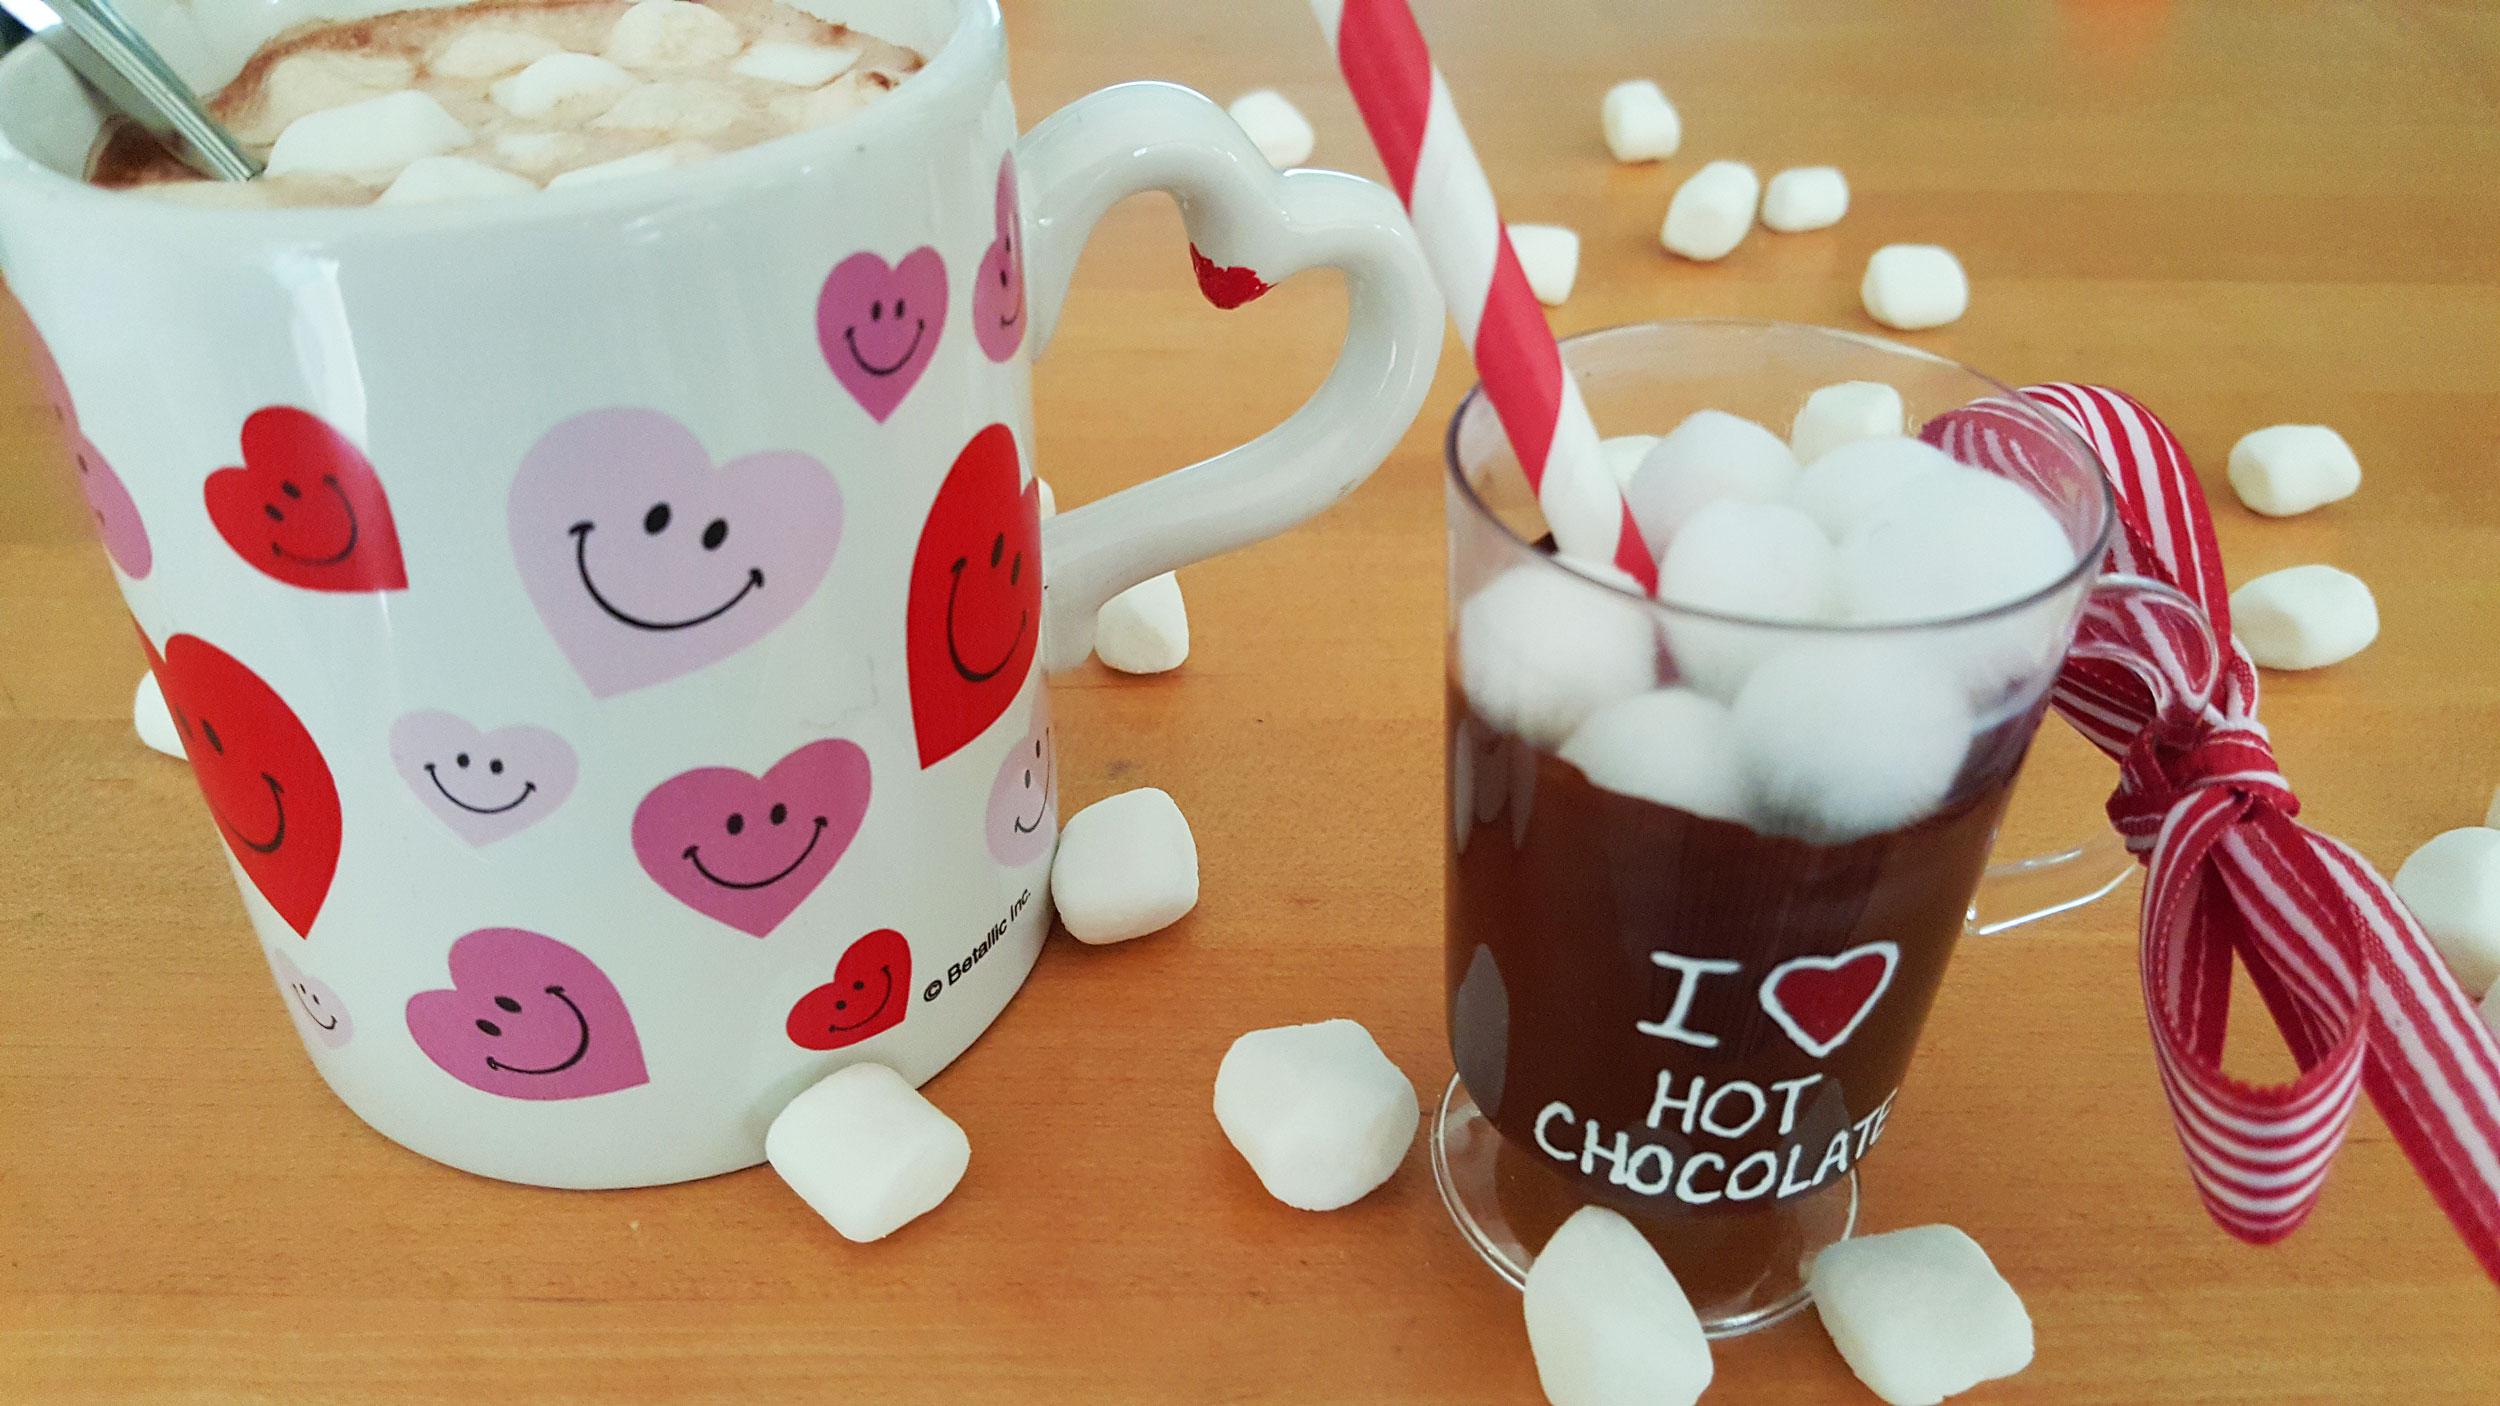 Cup of hot cocoa next to DIY Hot Chocolate Ornament | OrnamentShop.com